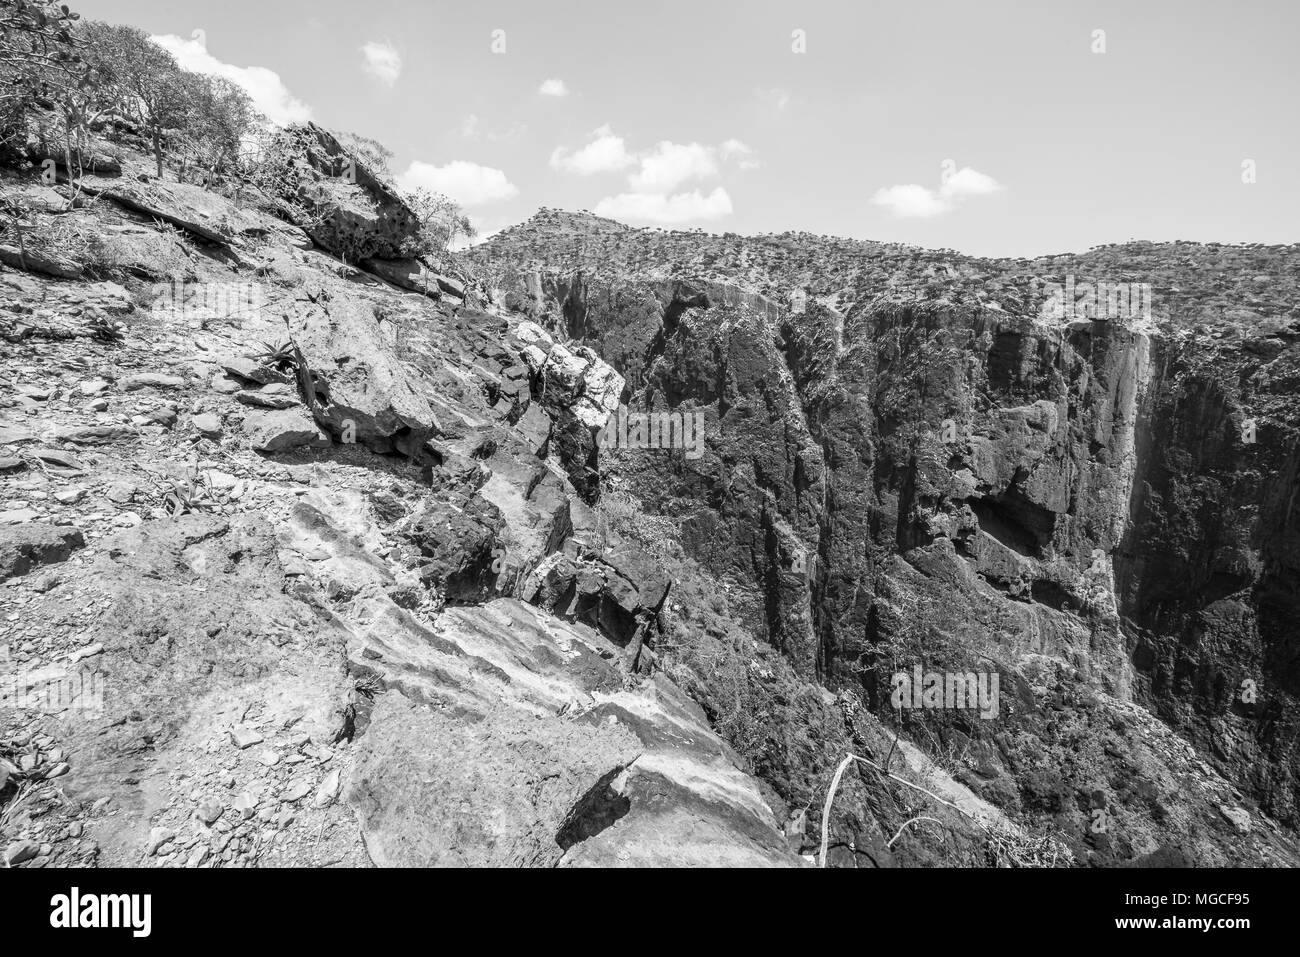 Rocks and nature of the Socotra Archipelago, UNESCO World Heritage - Stock Image